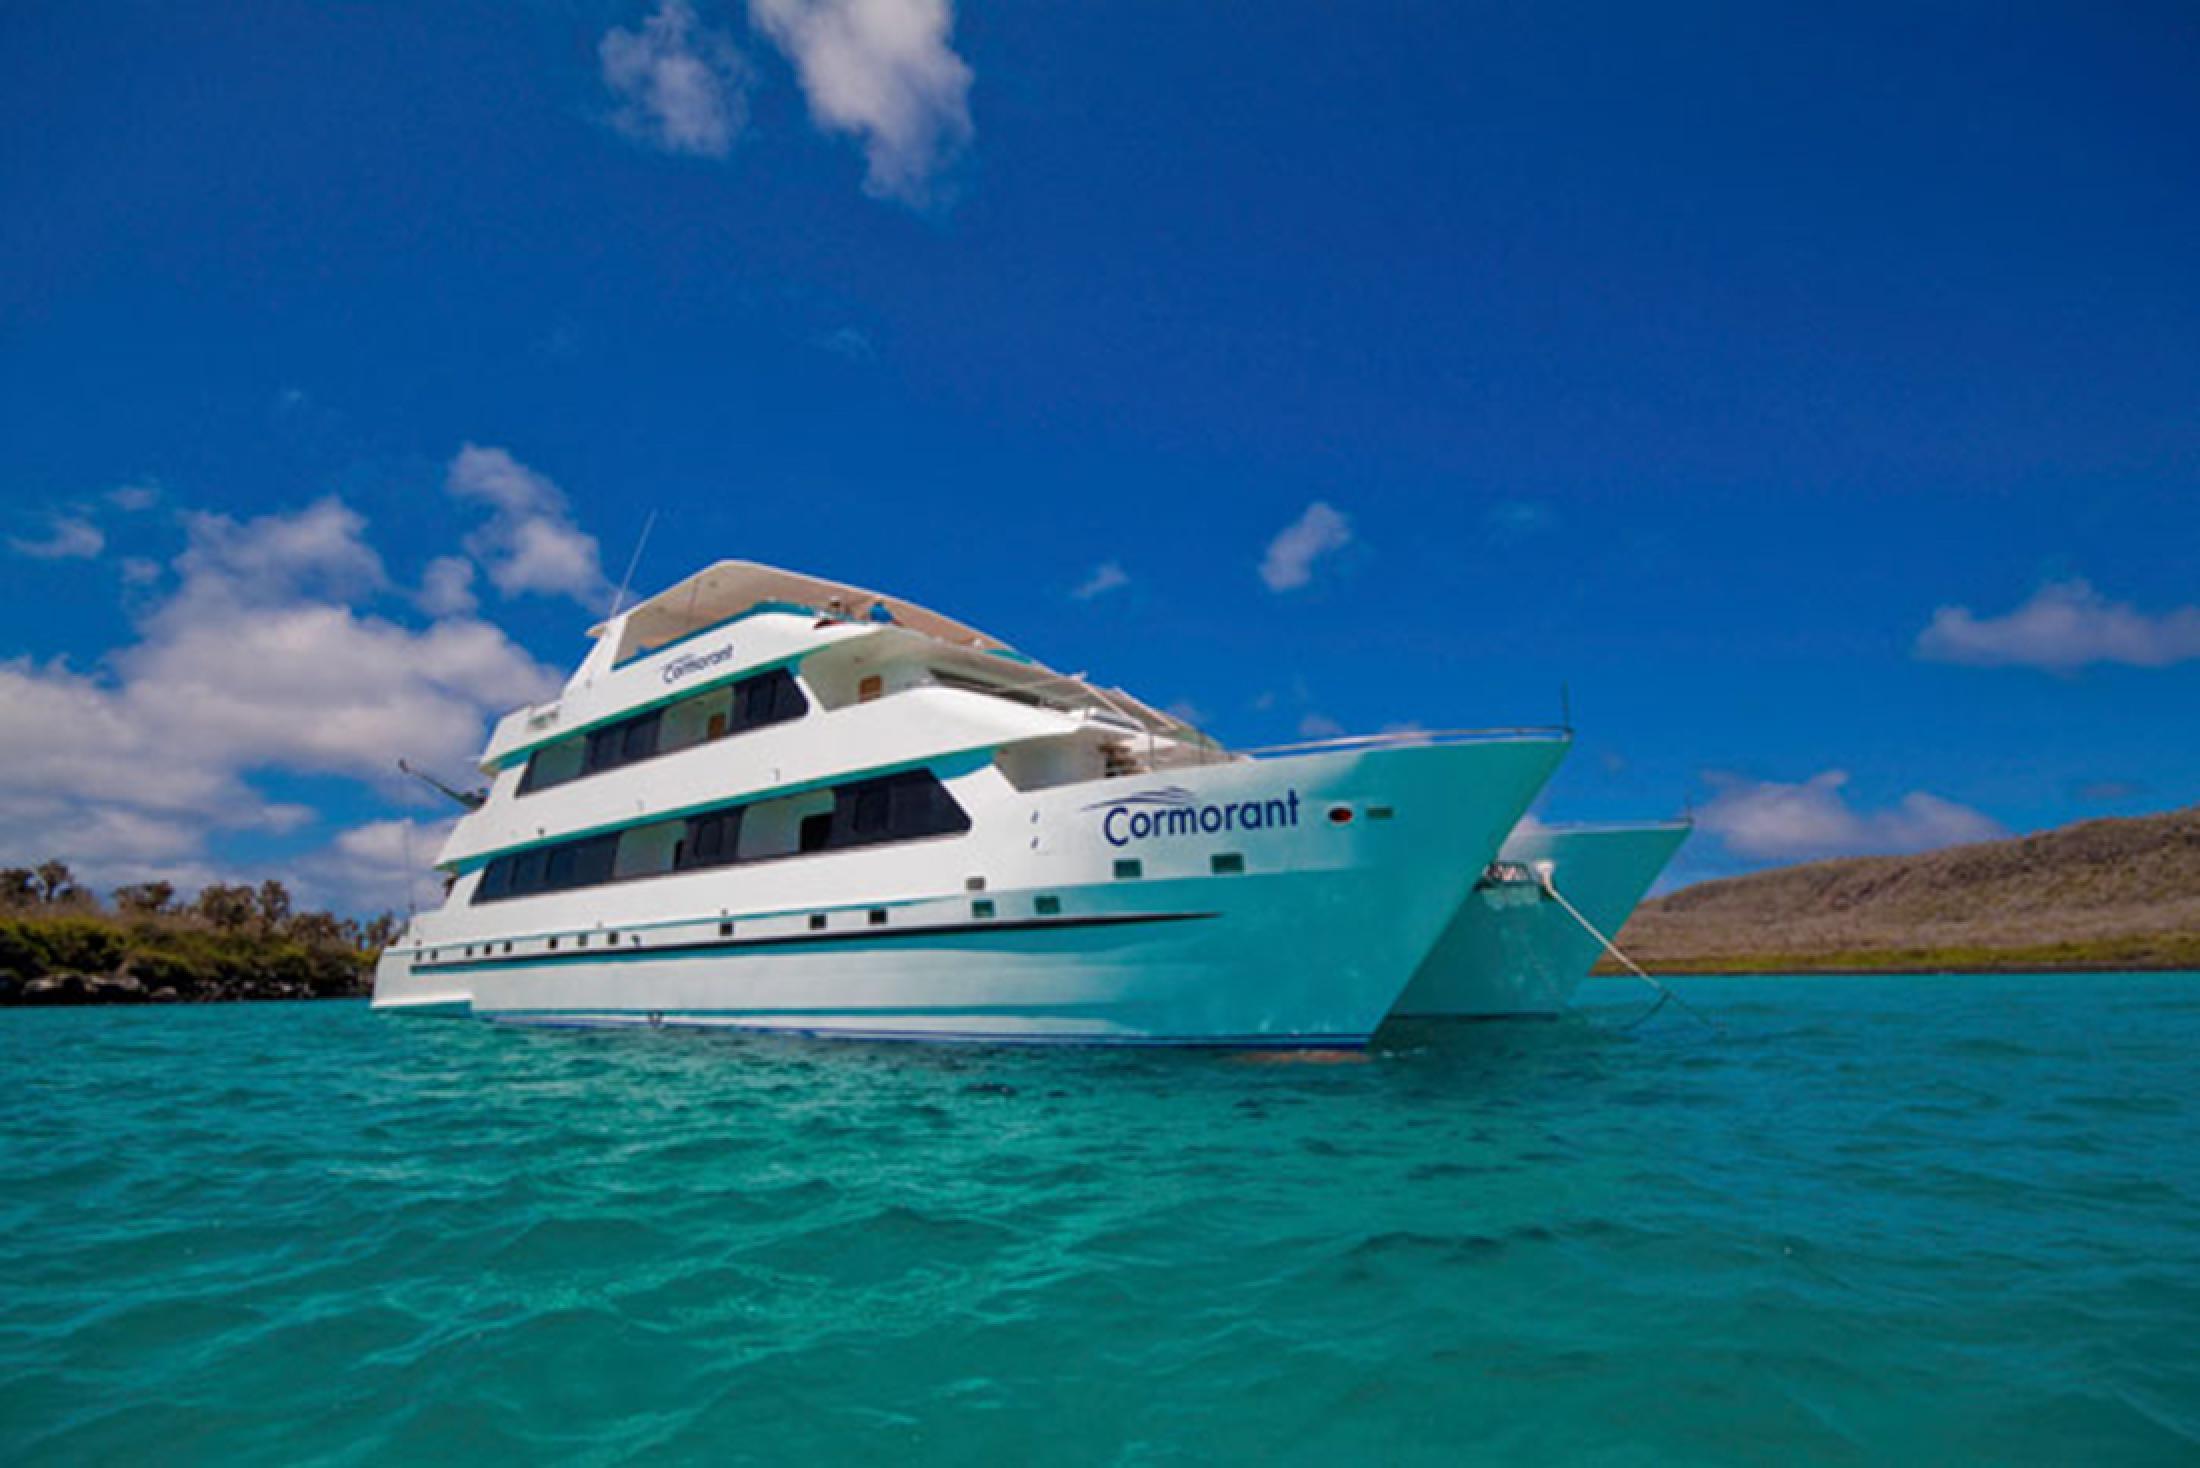 Luxury Cormorant Cruise Galápagos Islands